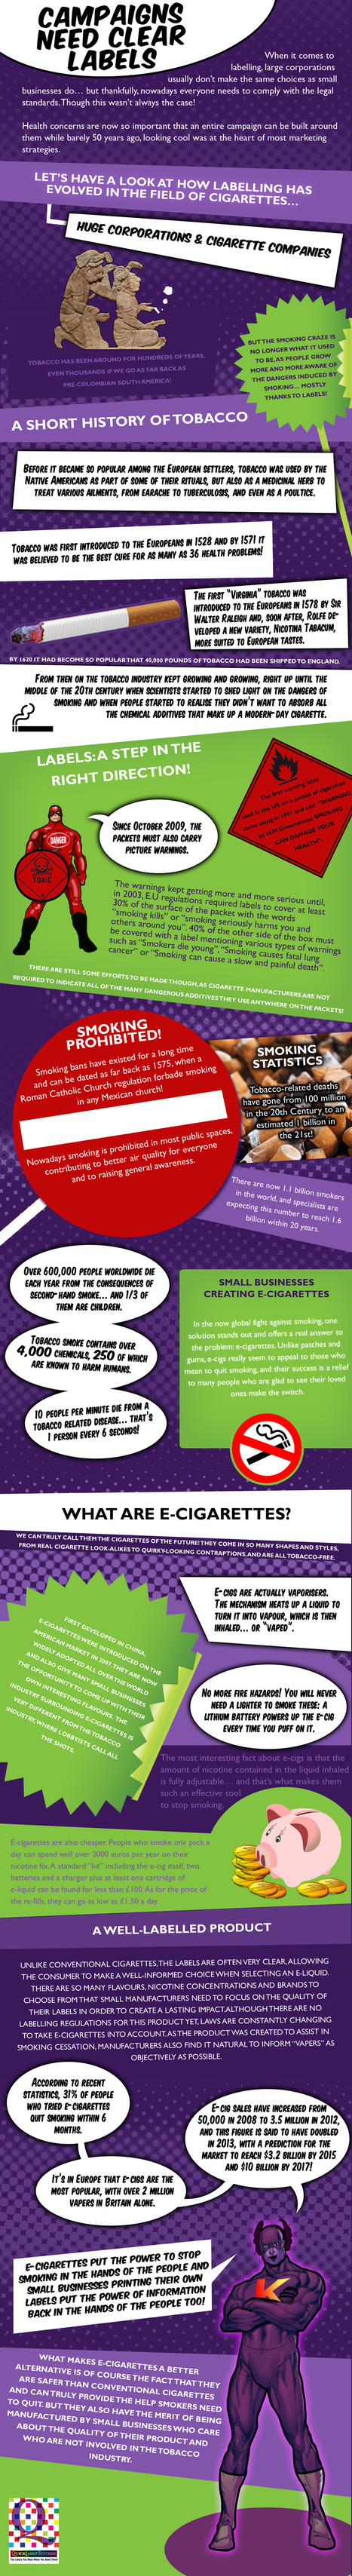 Small businesses love label printers | Colour Label Printers | Scoop.it